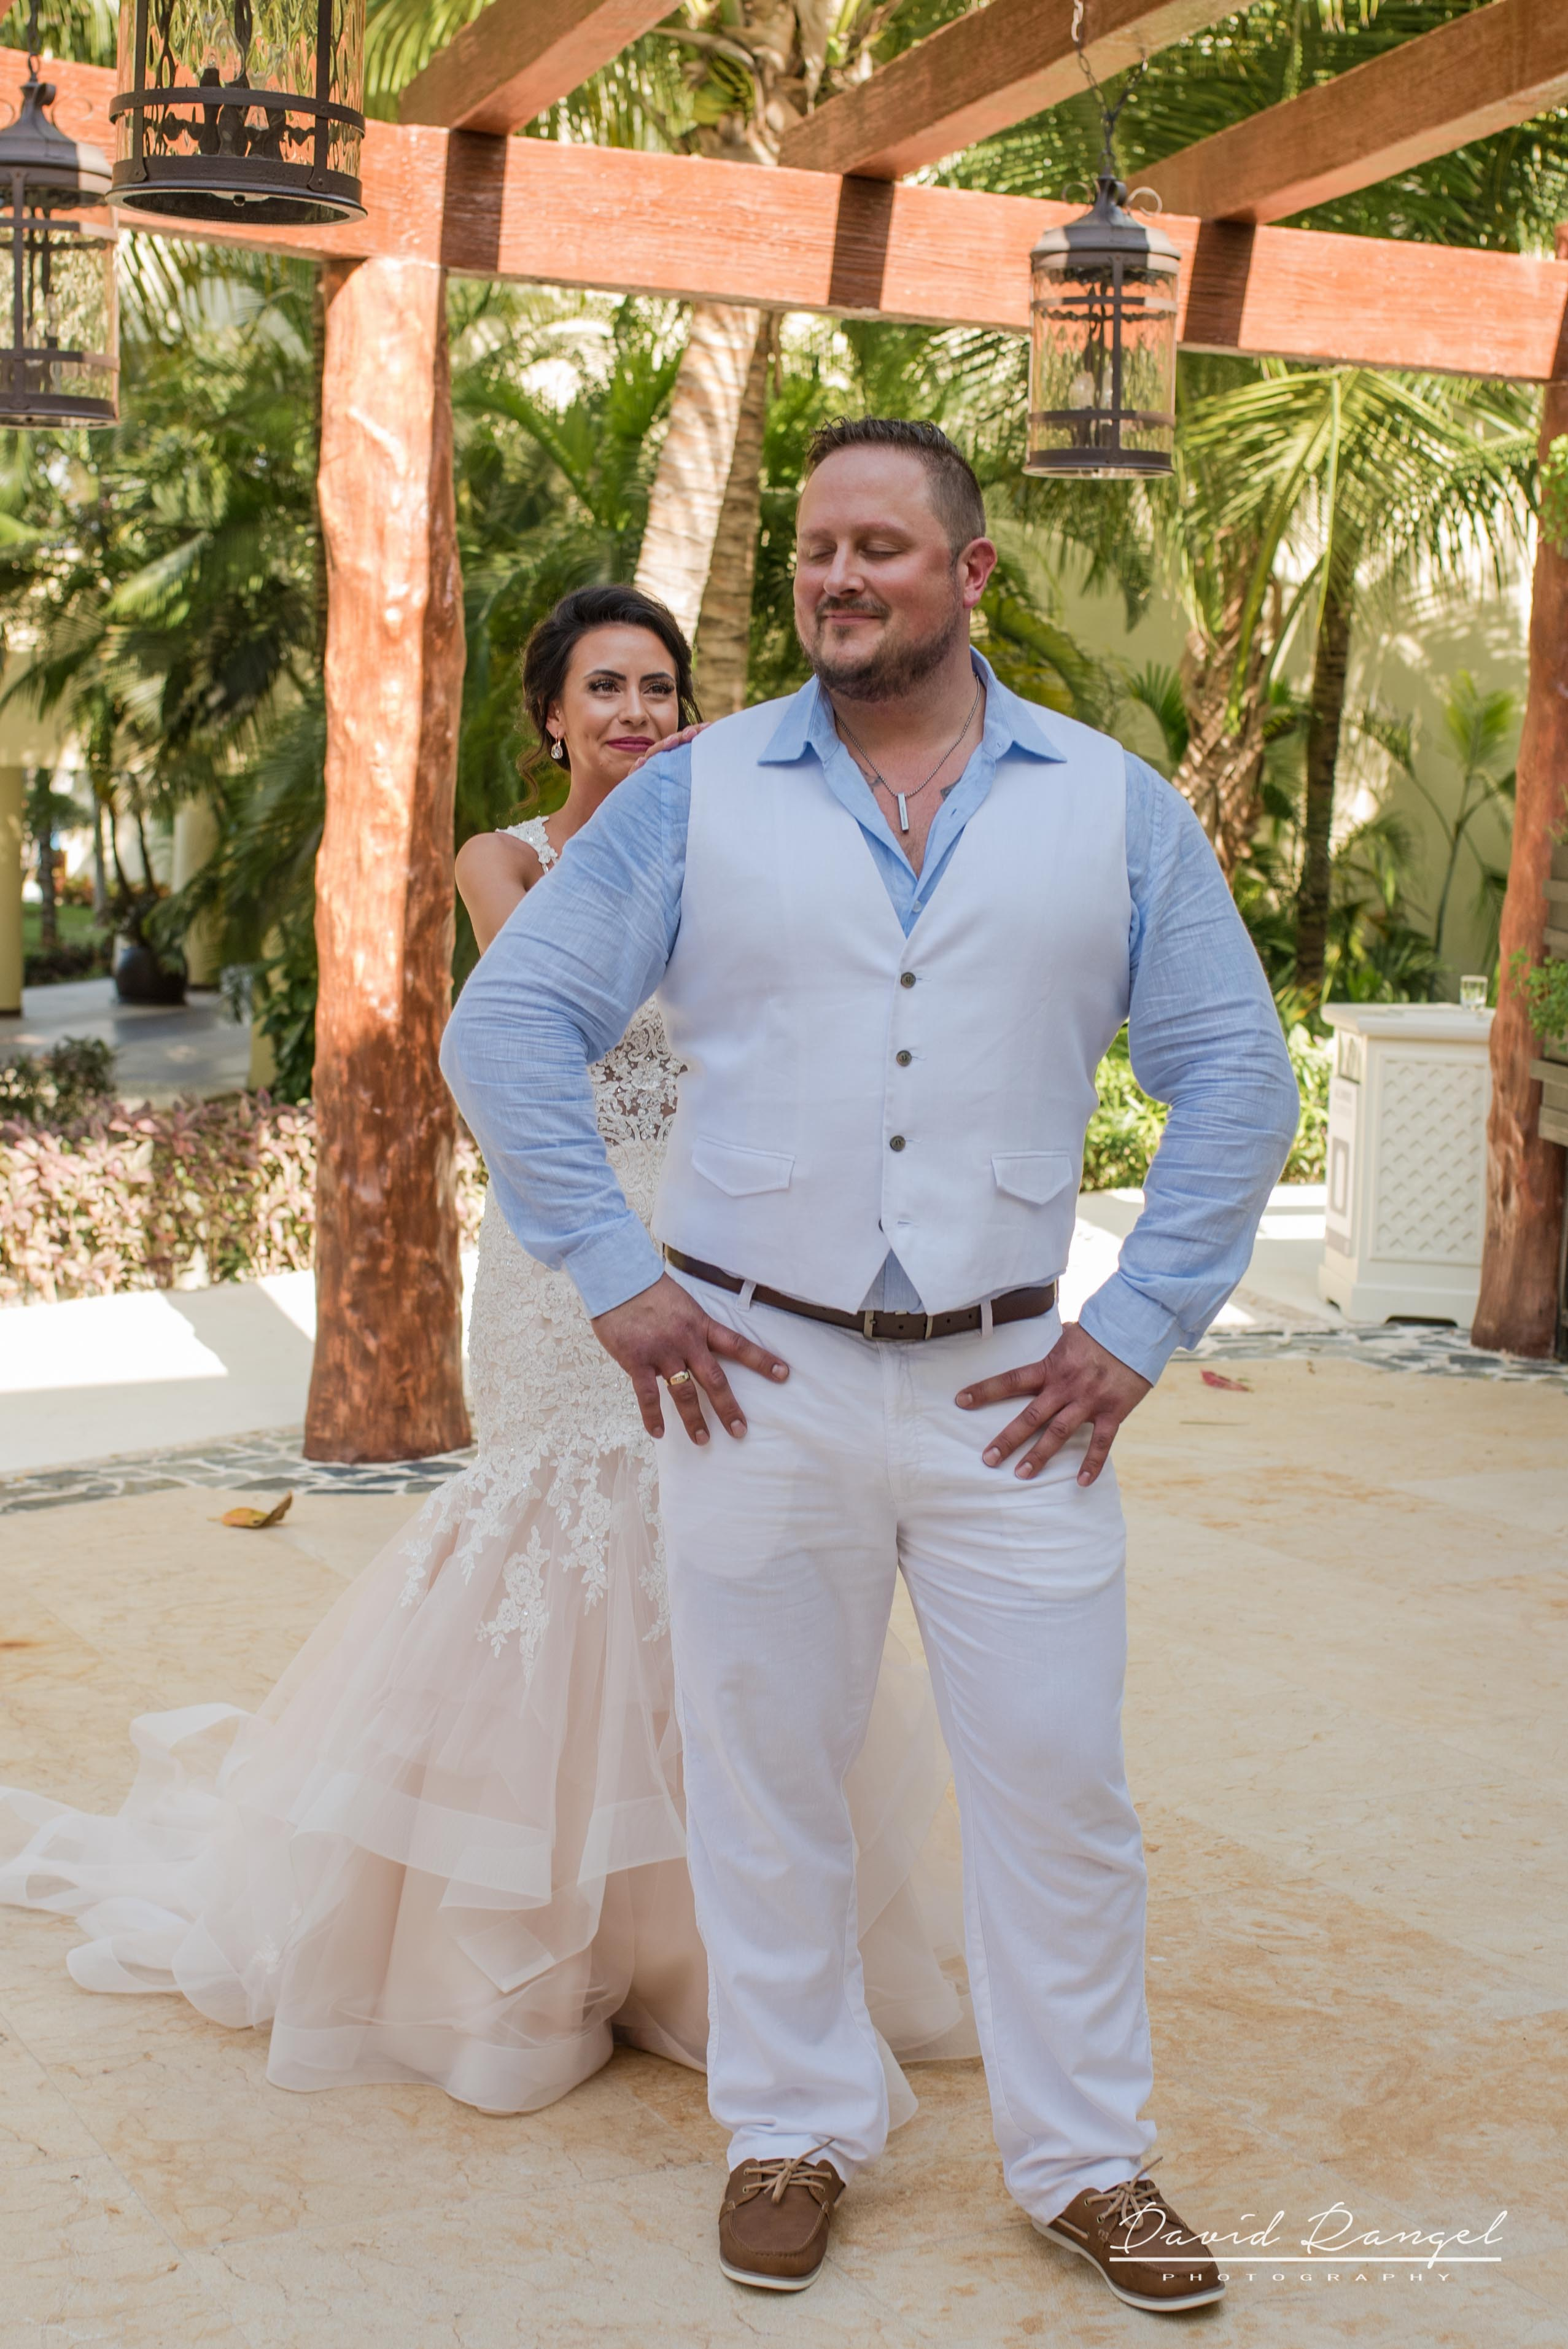 firstlook+bride+groom